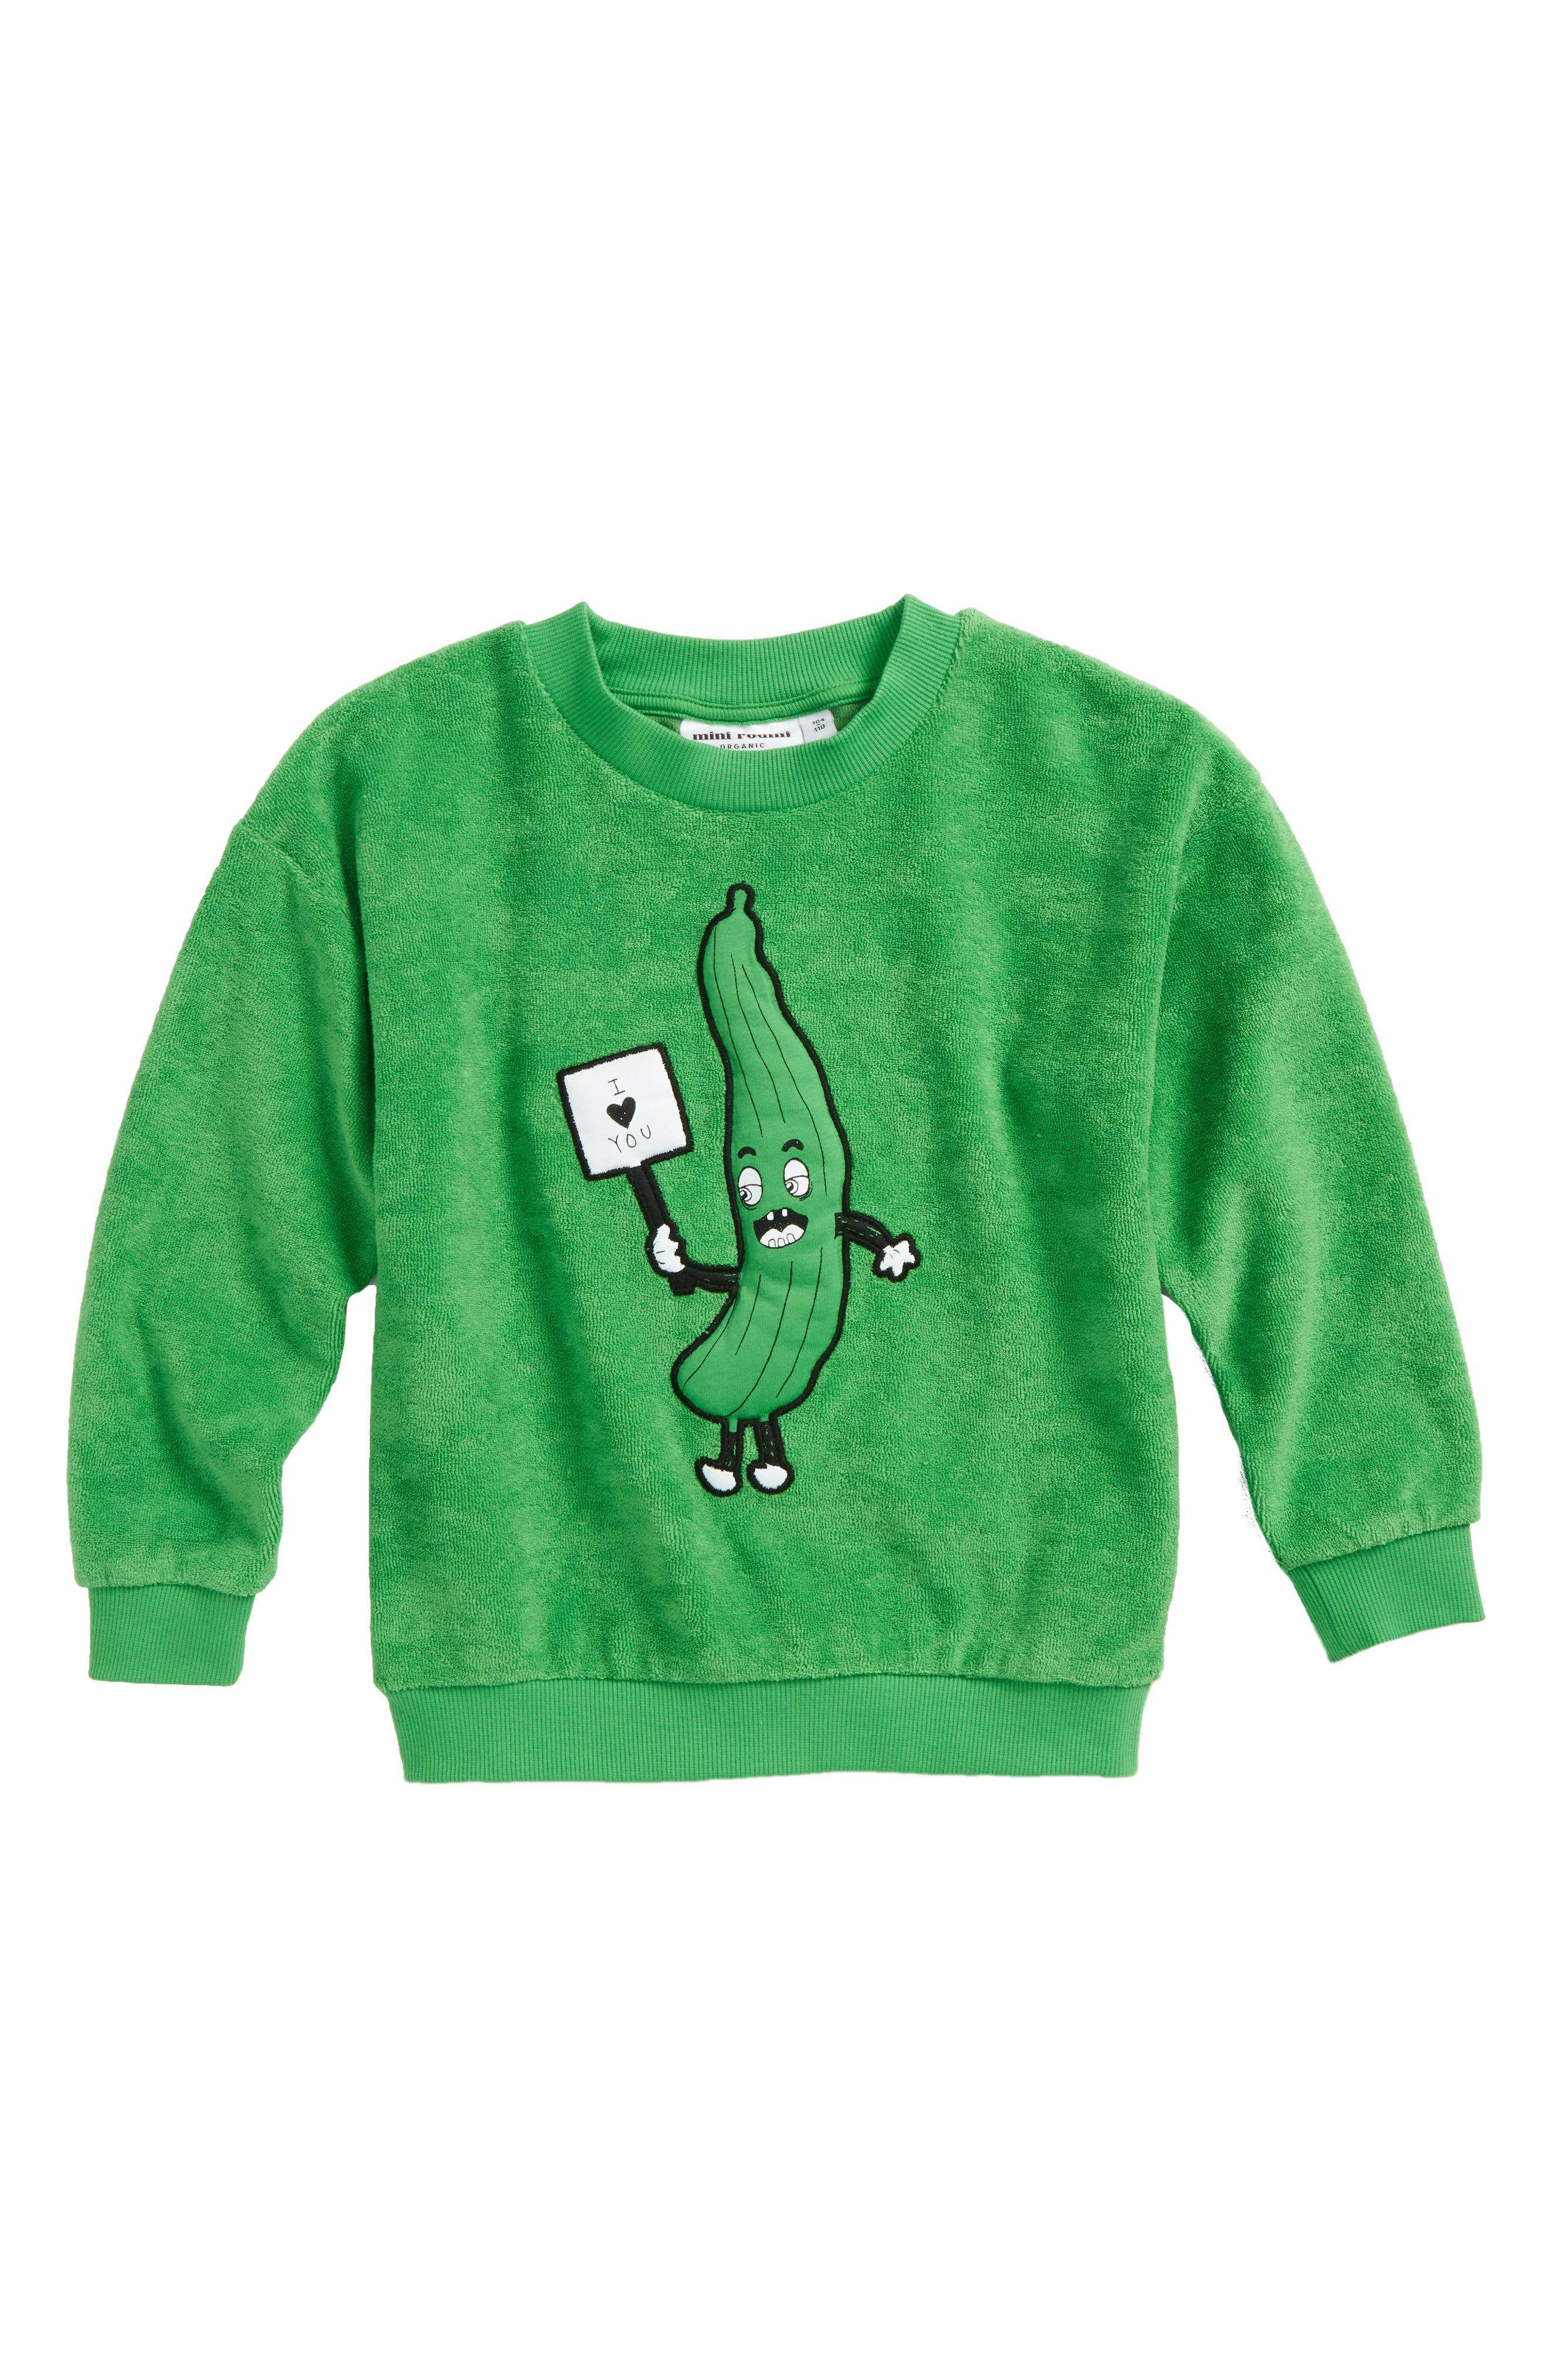 Cucumber Terry Sweatshirt,                         Main,                         color, Green